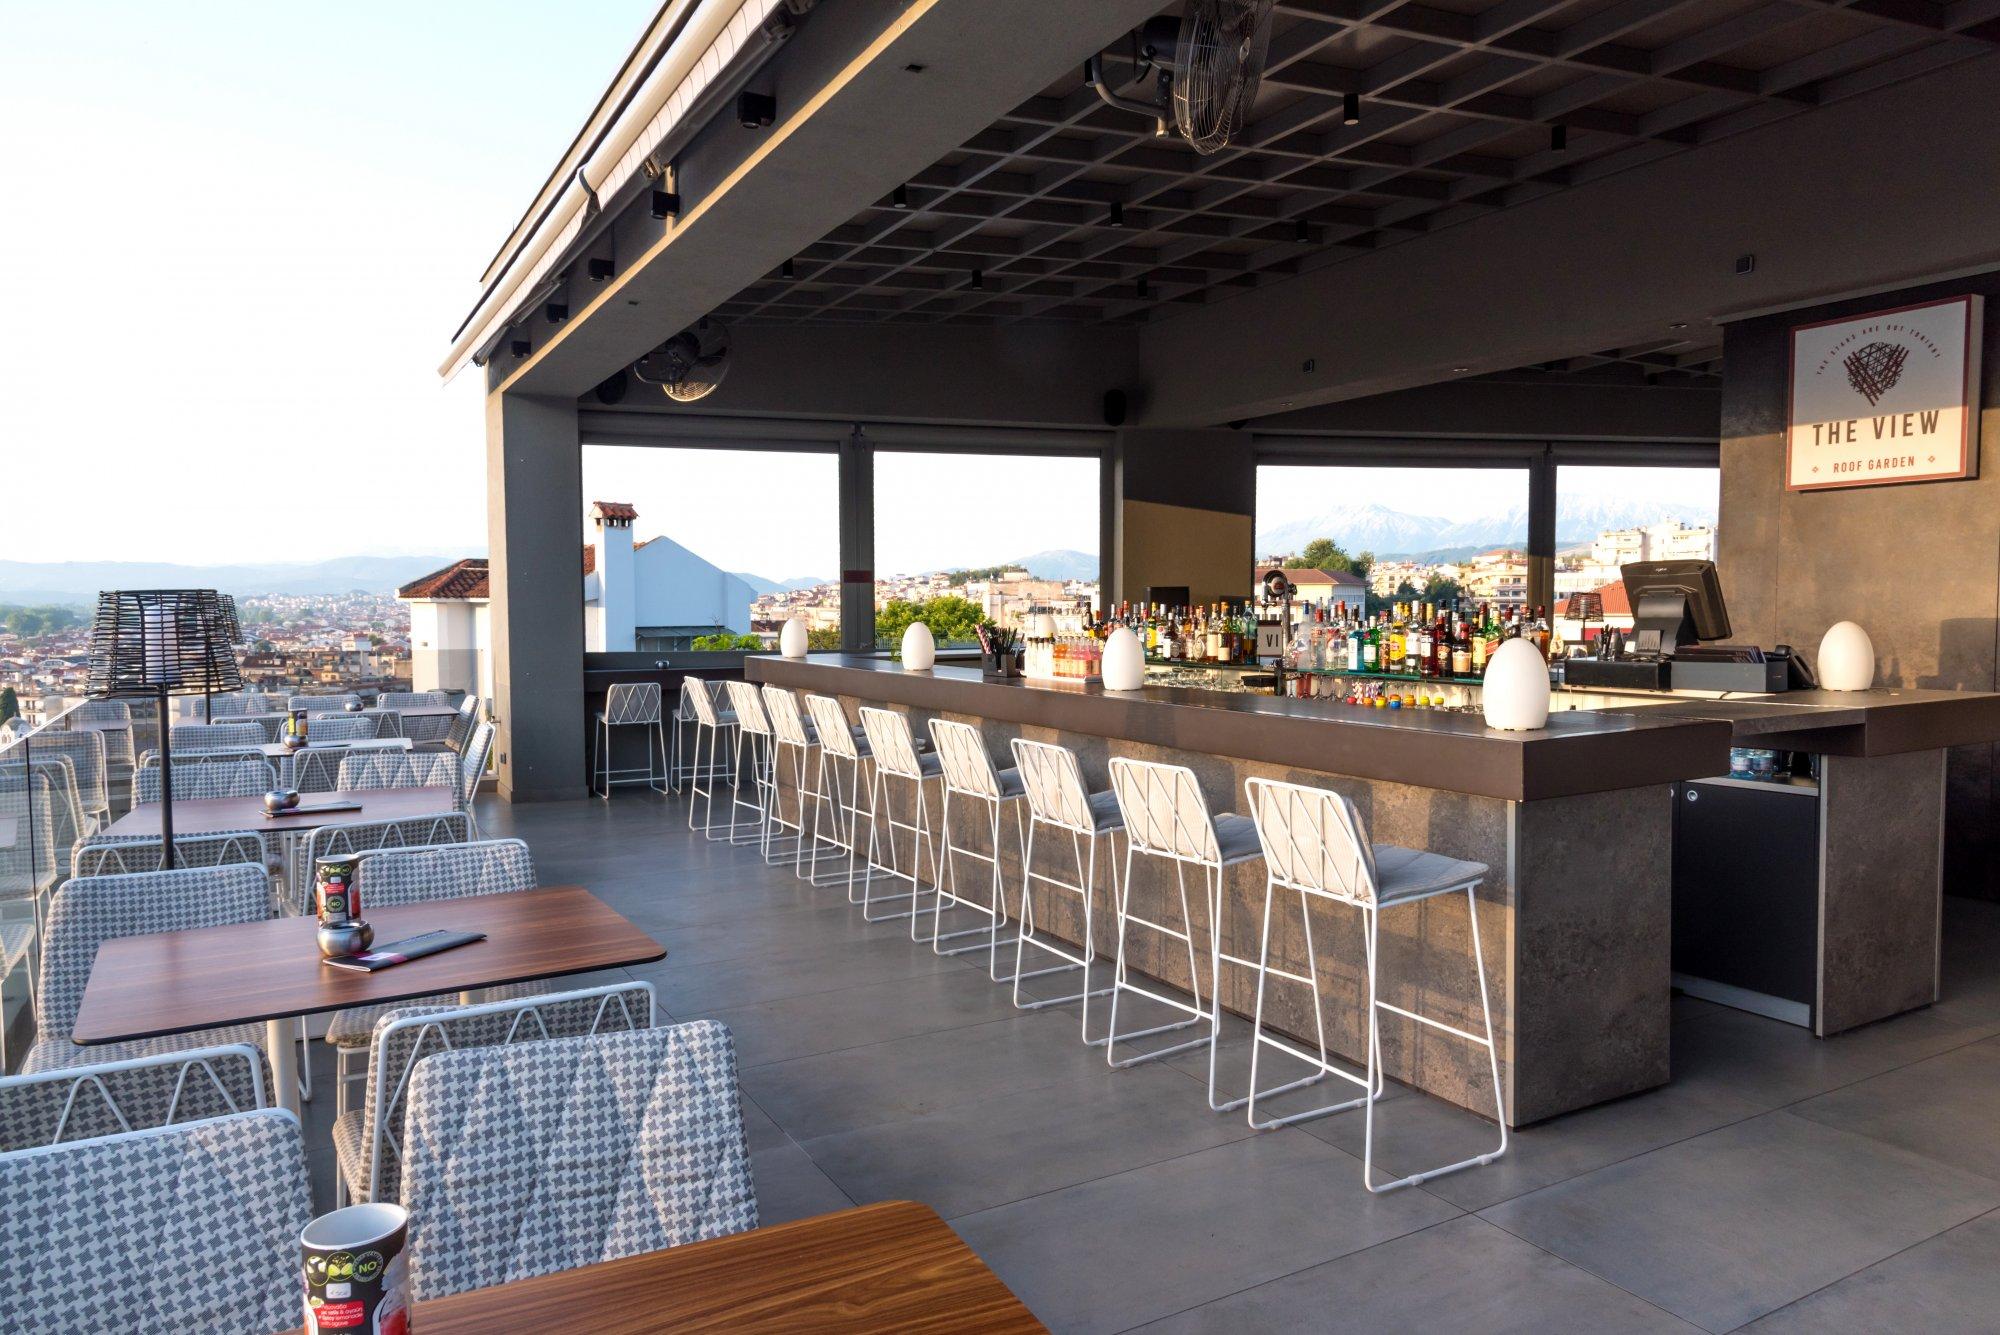 The View Roof Garden Saz City Life Hotel Iwannina